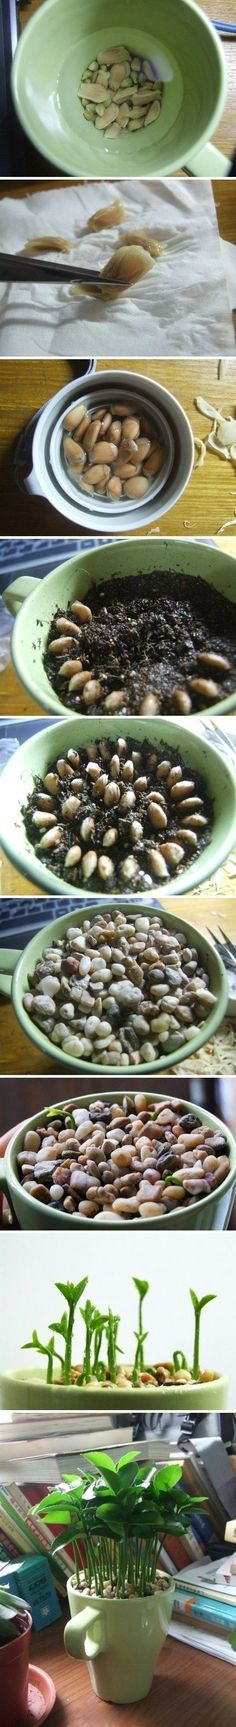 Alternative Gardning: How To Plant lemon seeds